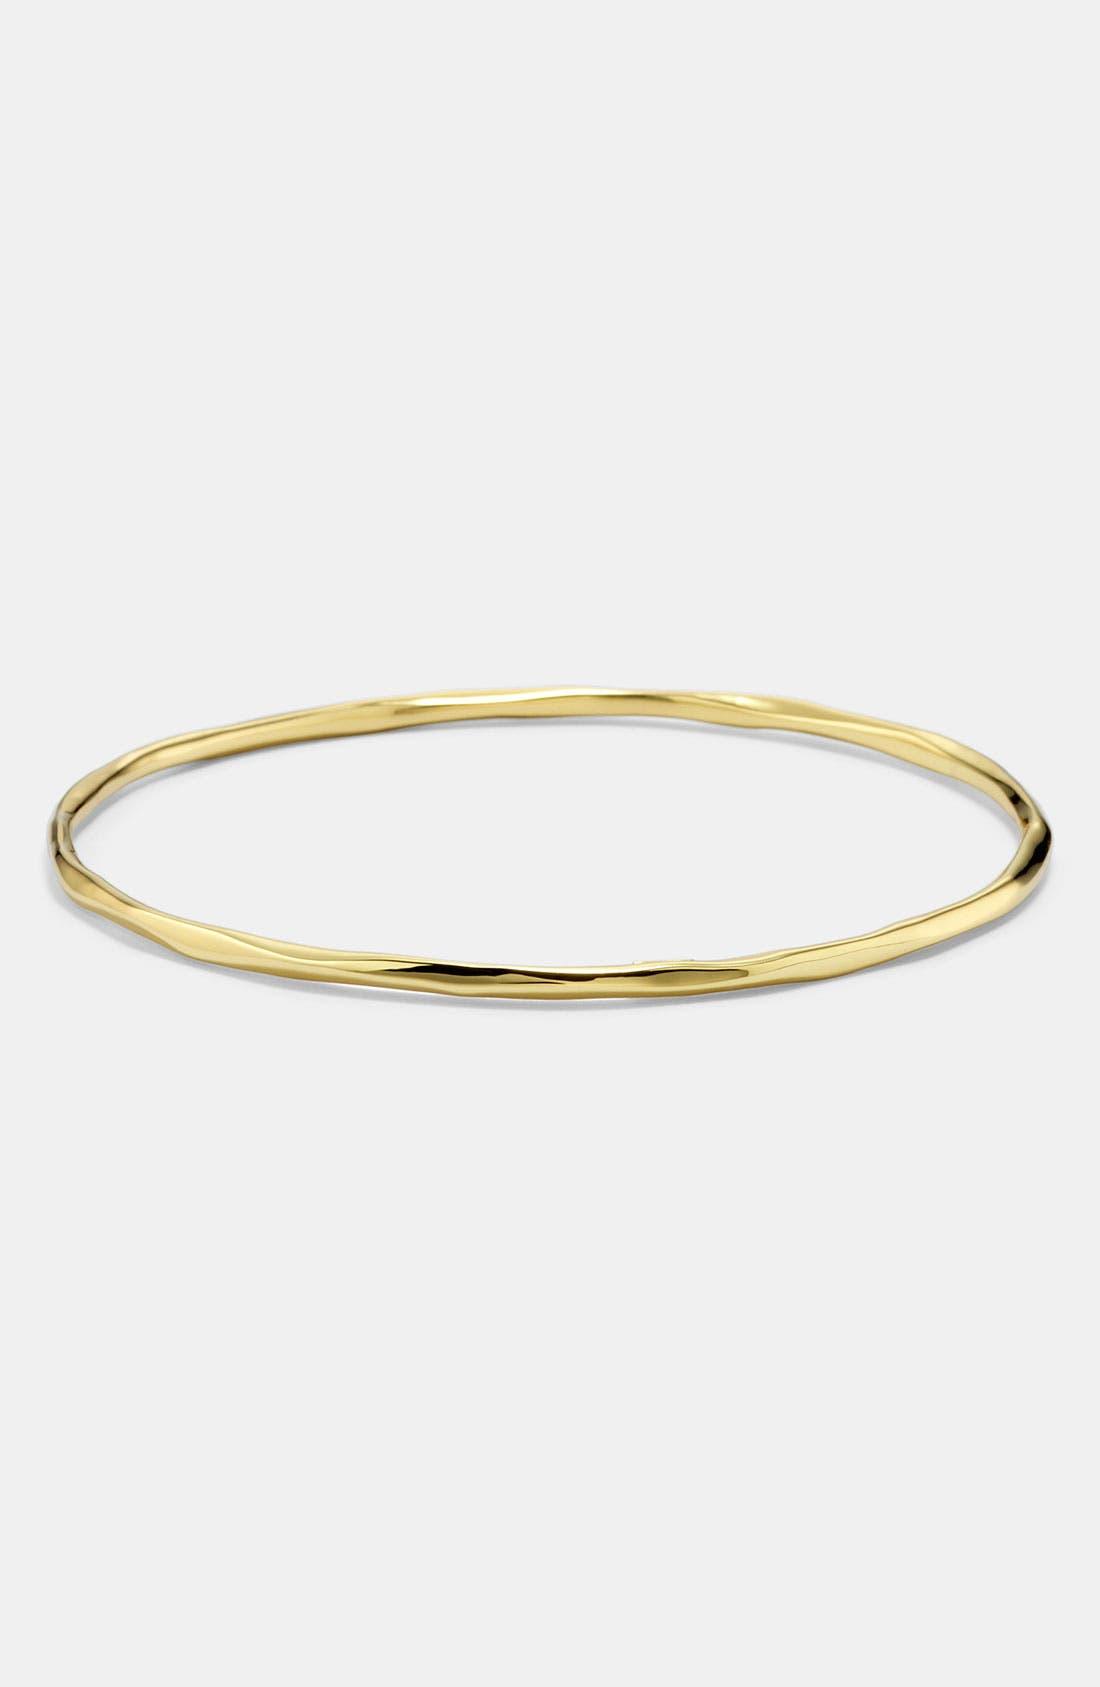 Alternate Image 1 Selected - Ippolita 'Glamazon' Faceted 18k Gold Bangle